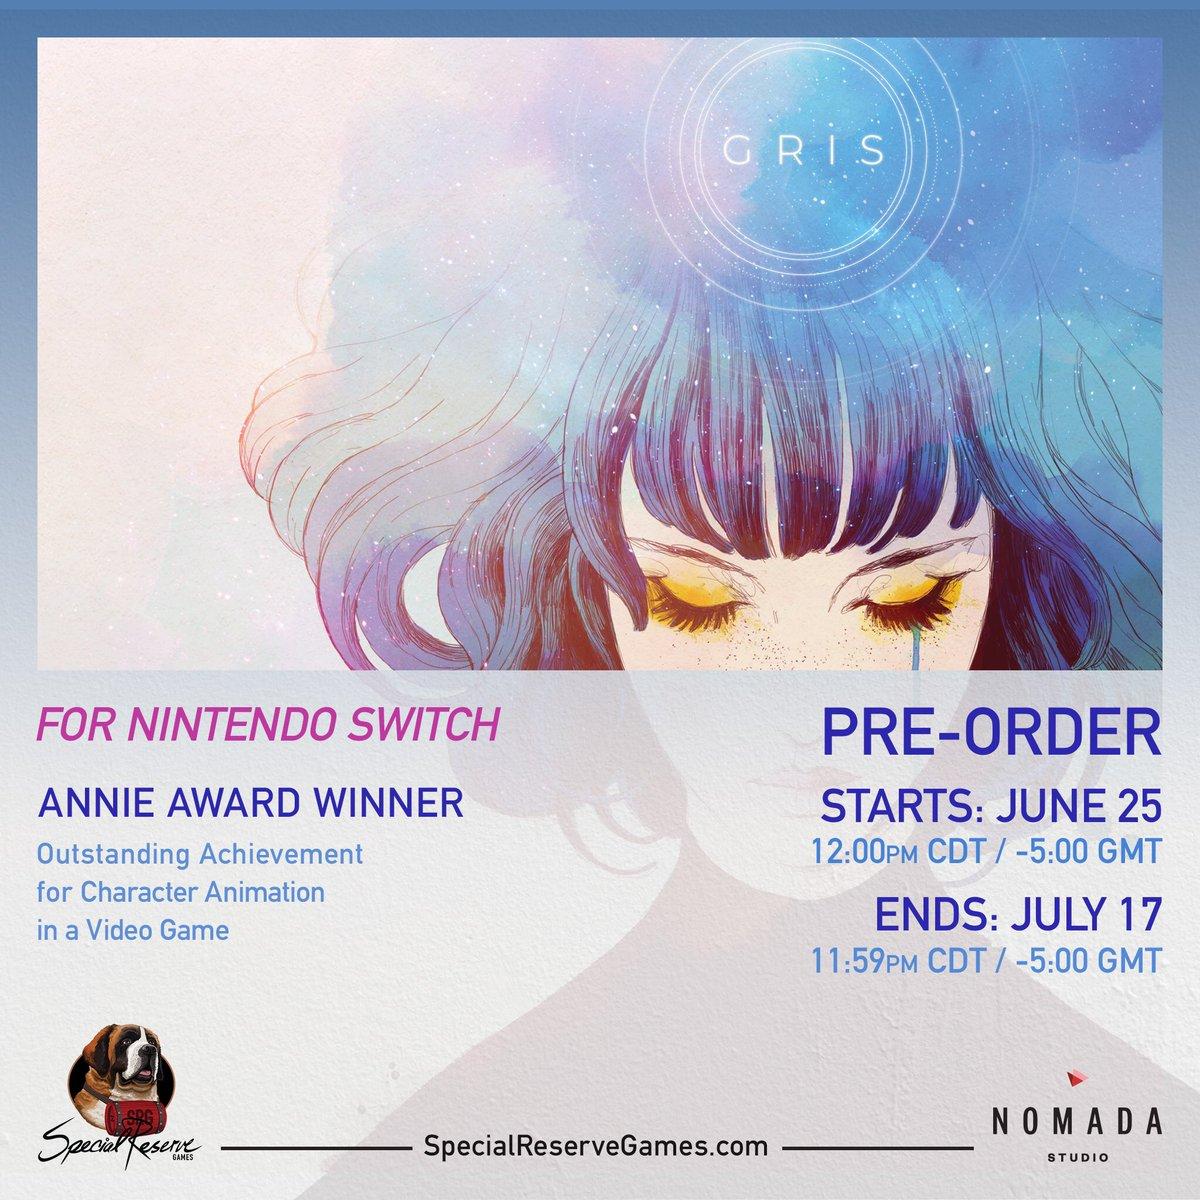 [PRECO] GRIS Nintendo switch Special Reserve Games D84w0PeXYAAUC91